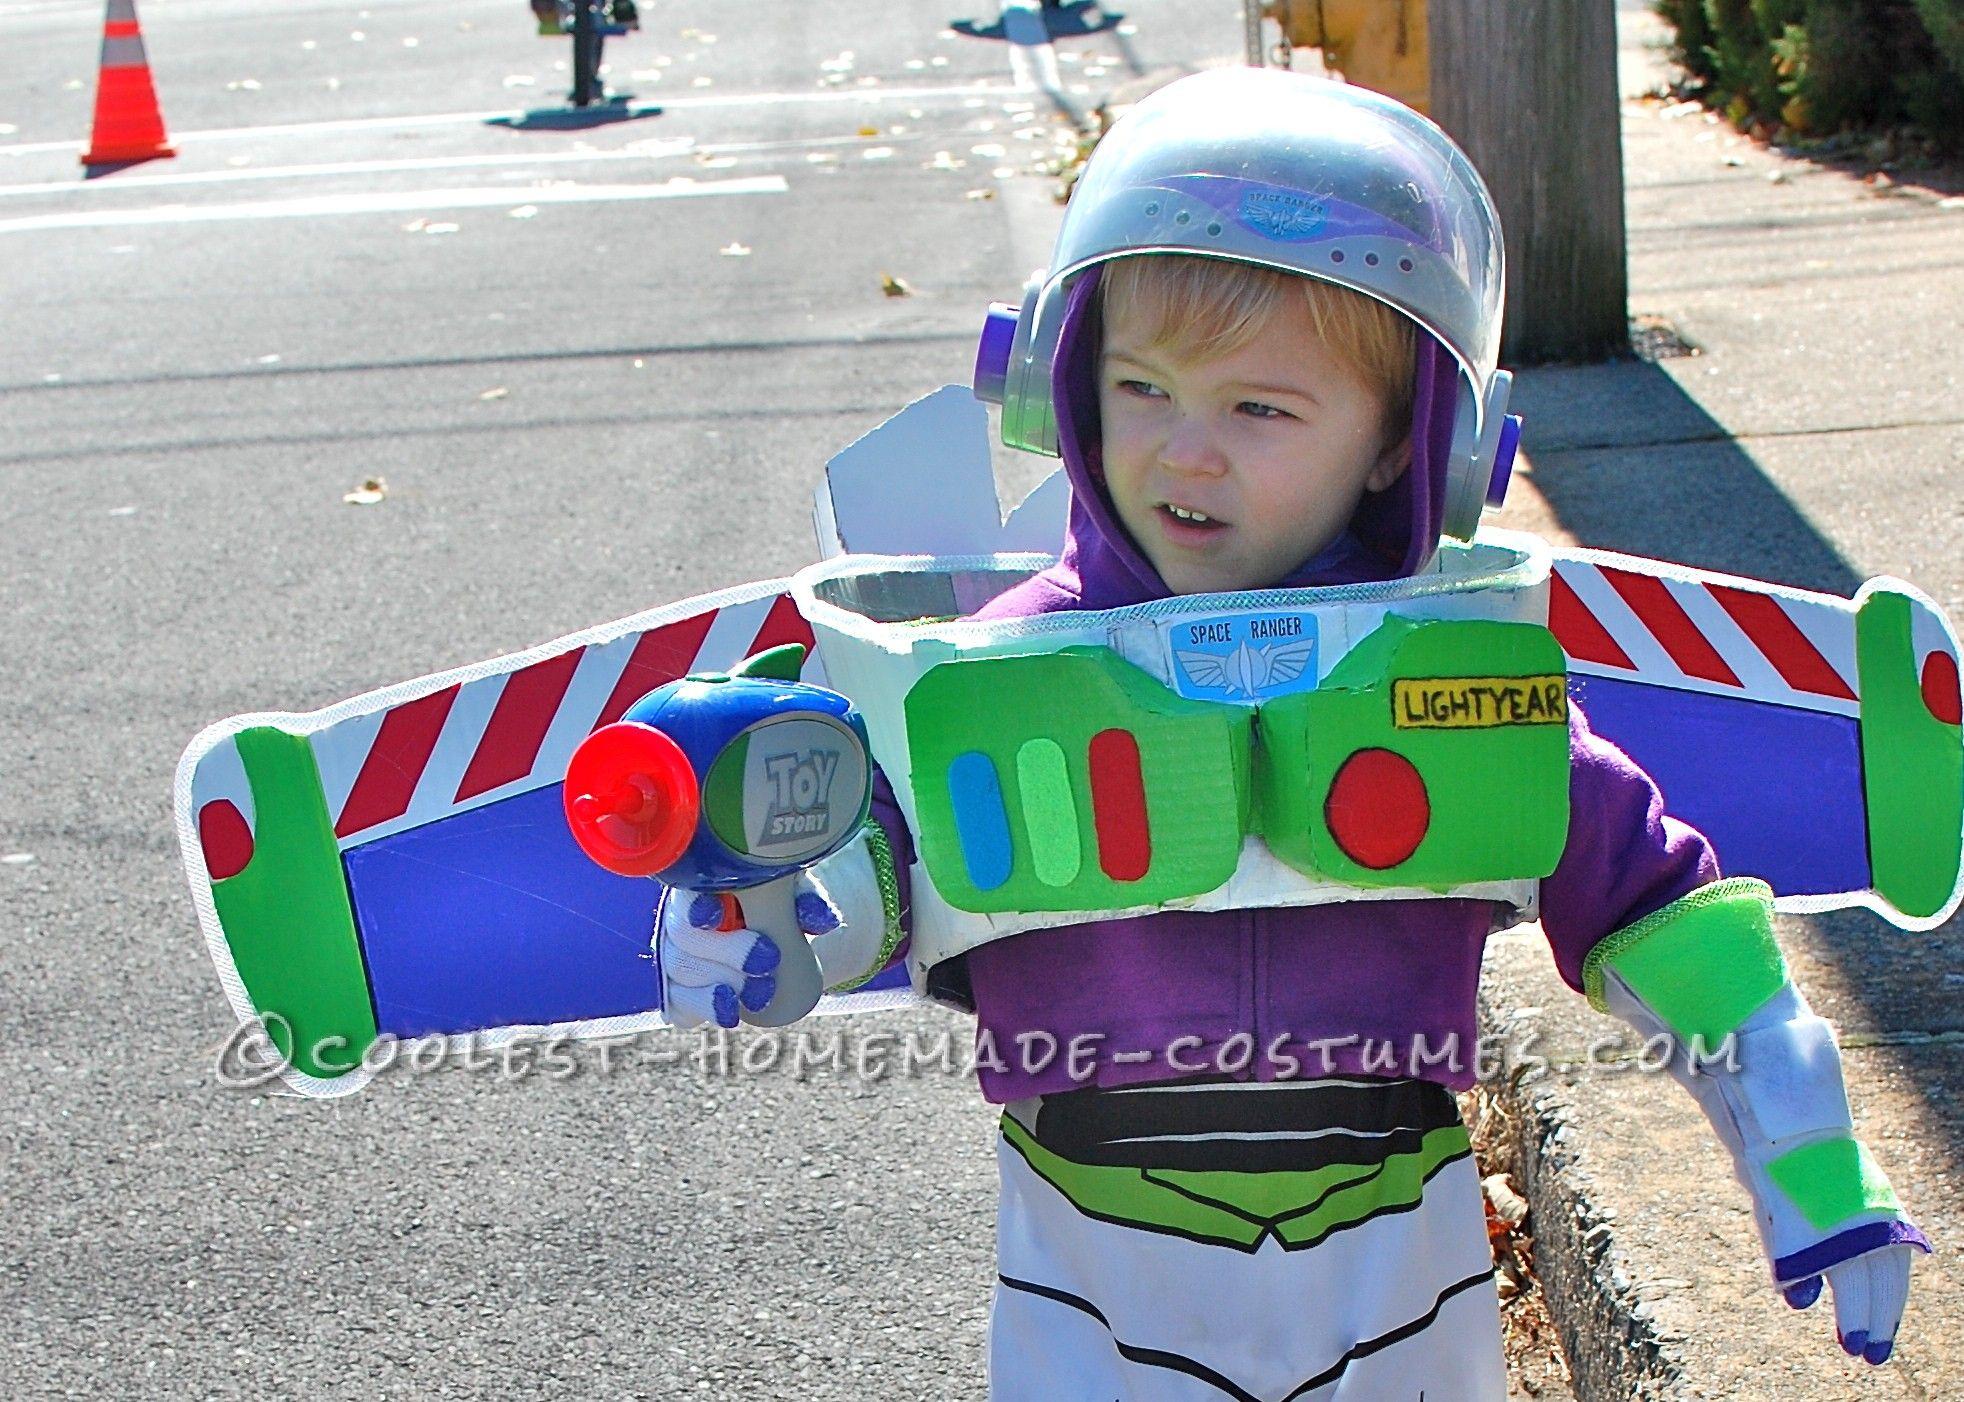 68b57e751e7 No-Sew Buzz Lightyear Costume for a Toddler | Coolest Homemade ...